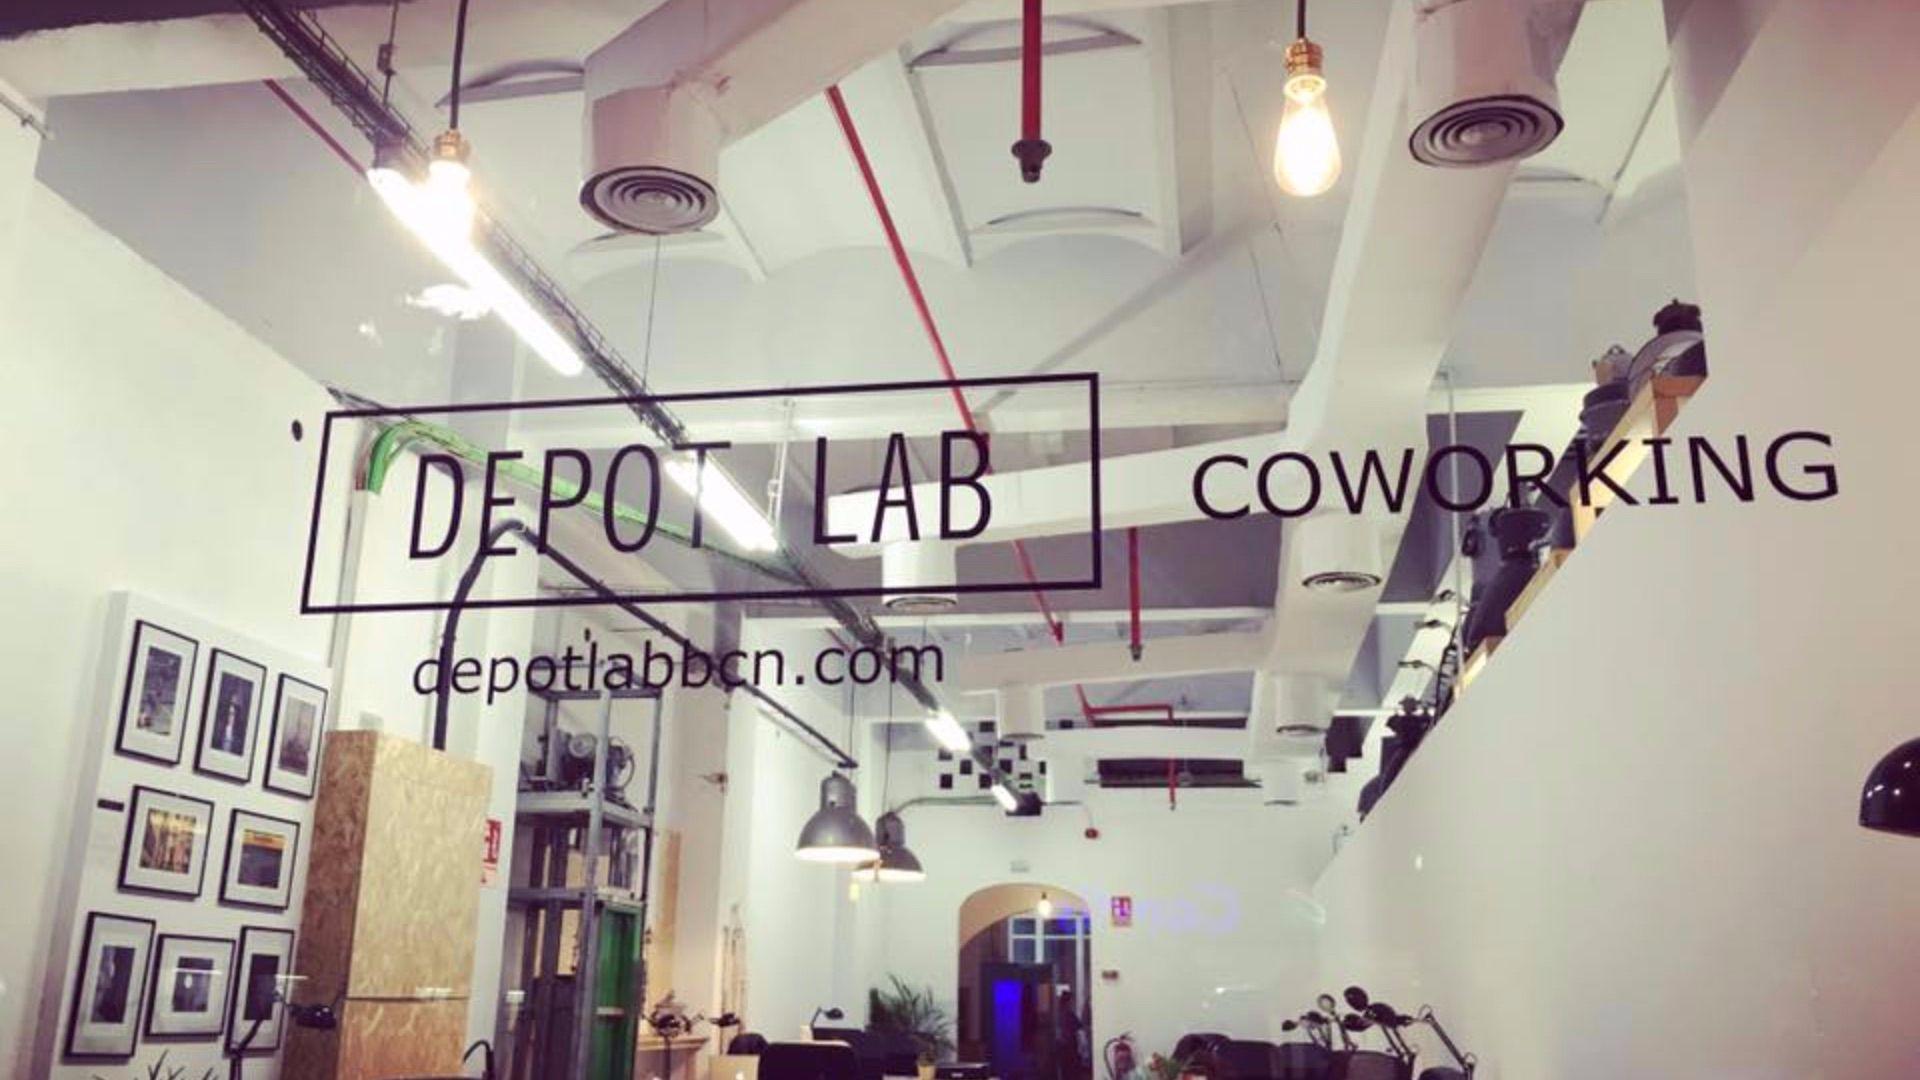 Depot Lab